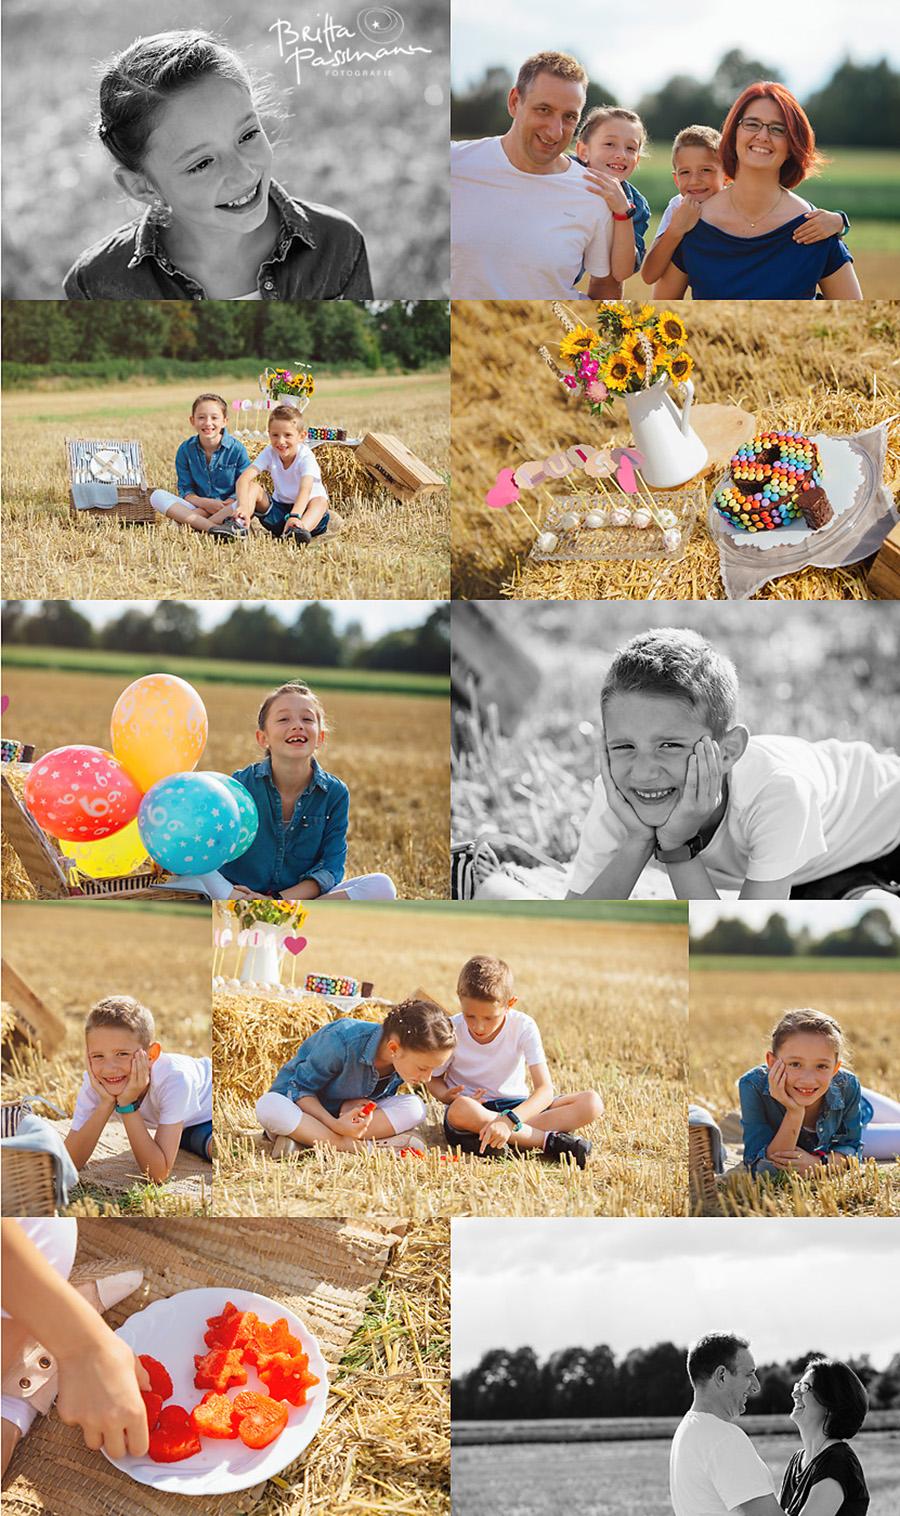 Familienpicknick_Fotoshooting_Familienfotos_Kinderfotos_Dortmund_Schwerte_13